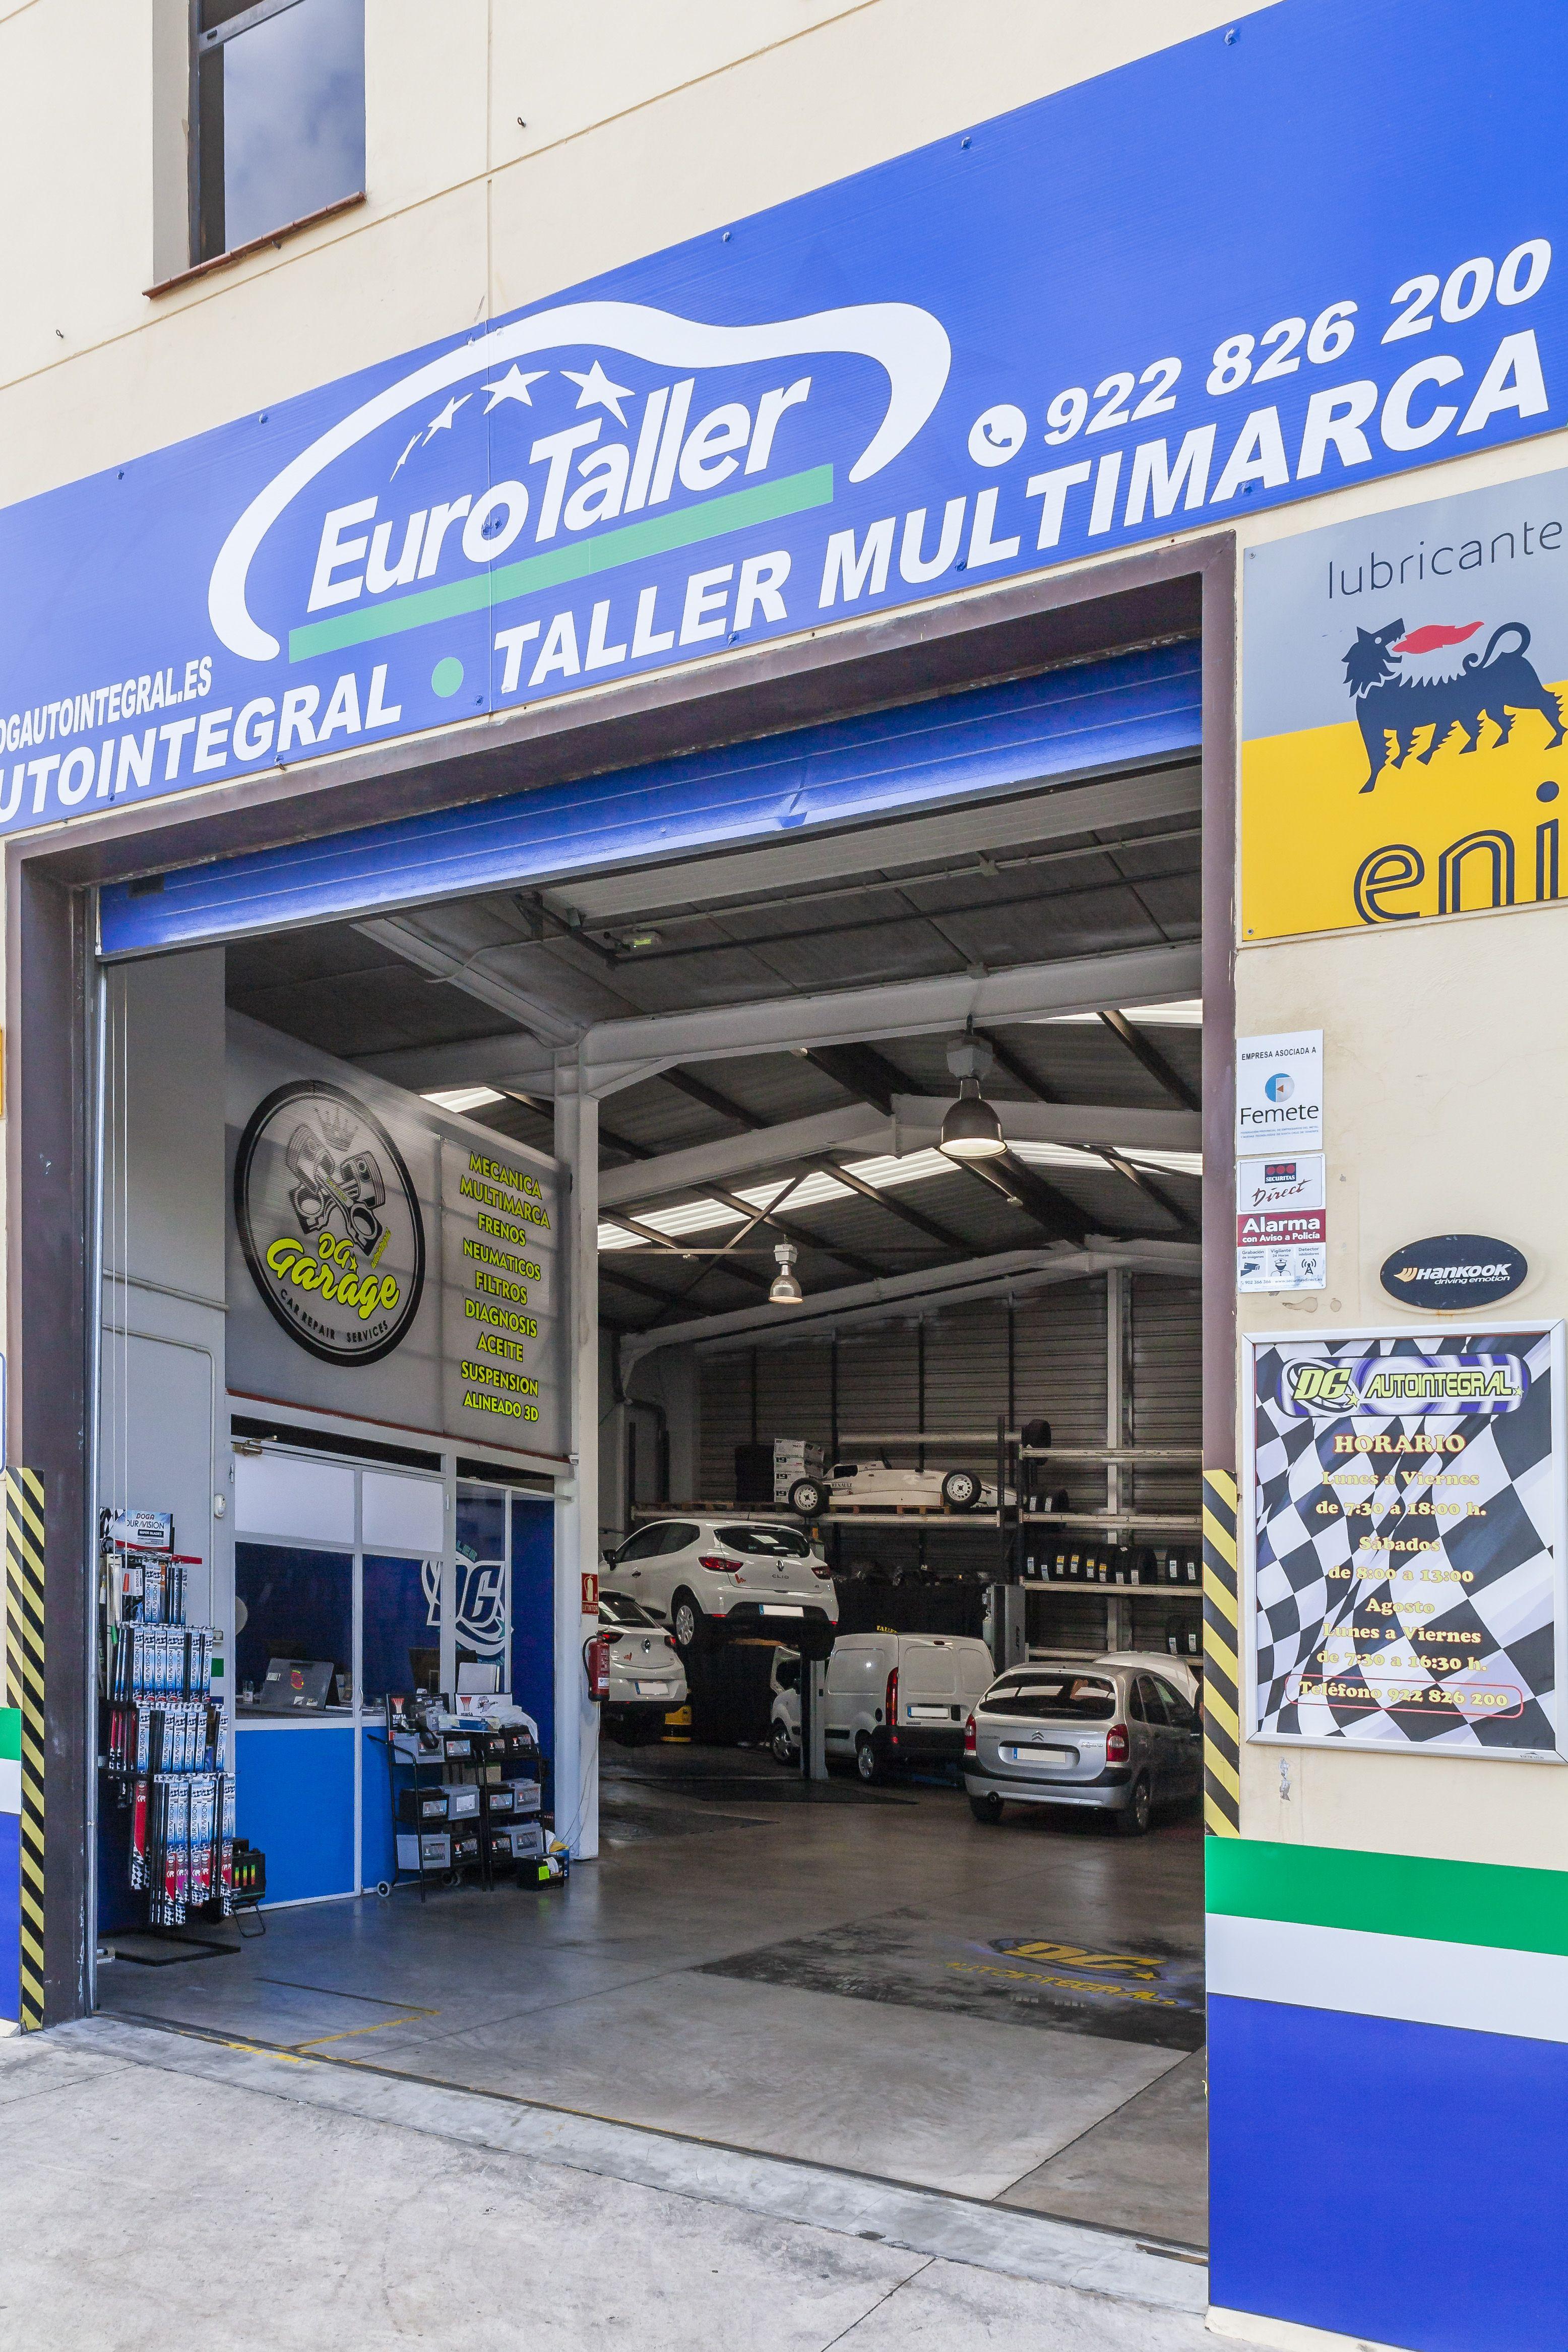 Foto 9 de Talleres de automóviles en Santa Cruz de Tenerife   DG Autointegral